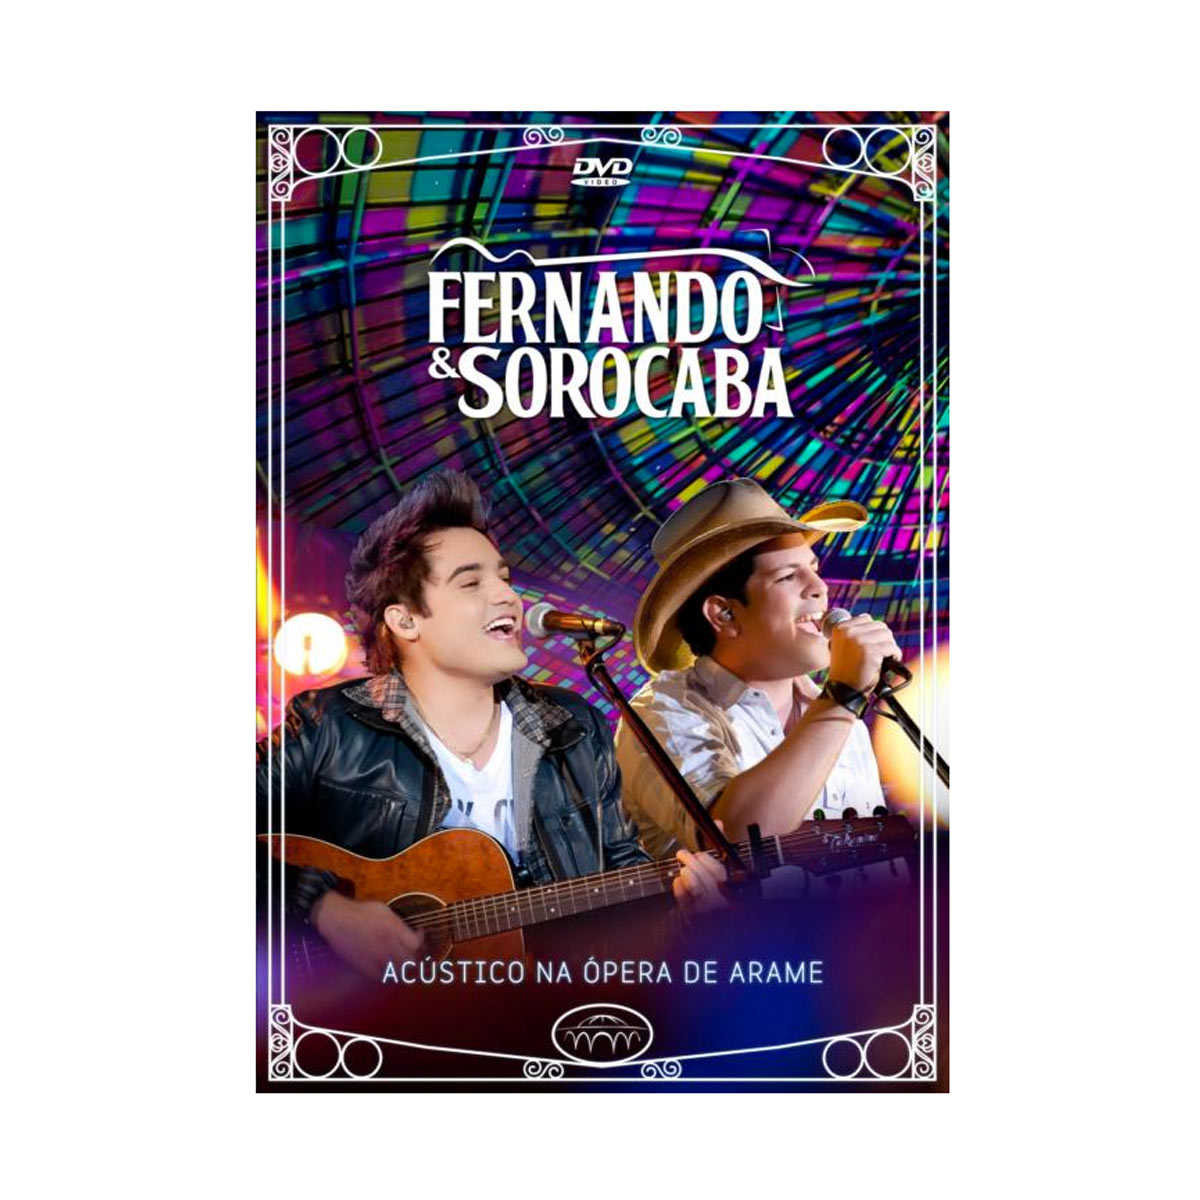 DVD Fernando & Sorocaba Ópera de Arame